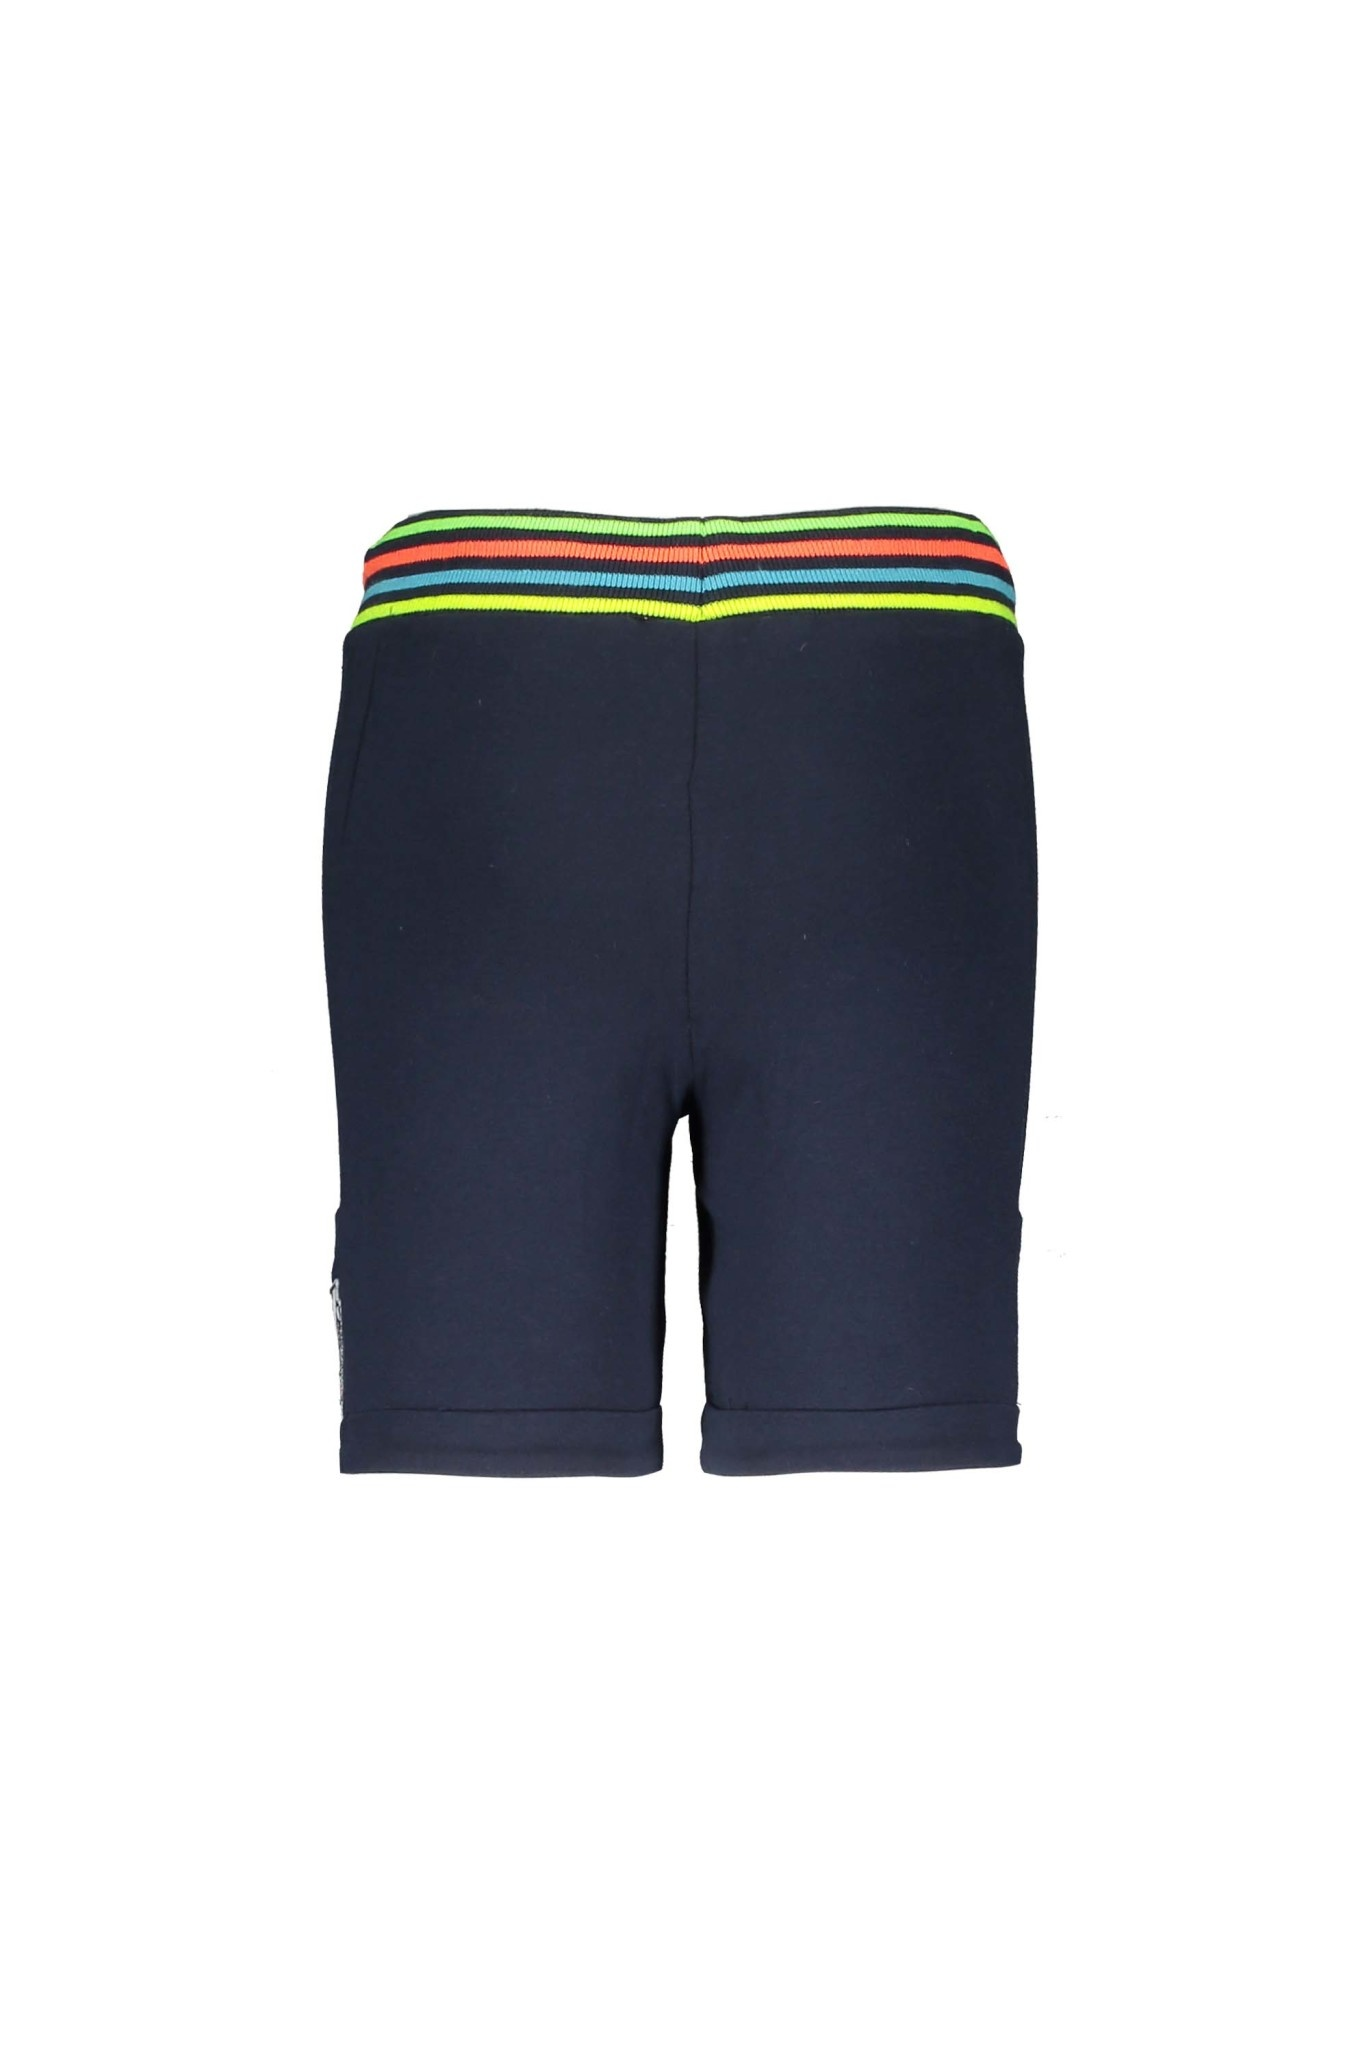 B.Nosy Jongens Short Zakken Y003-6621-2